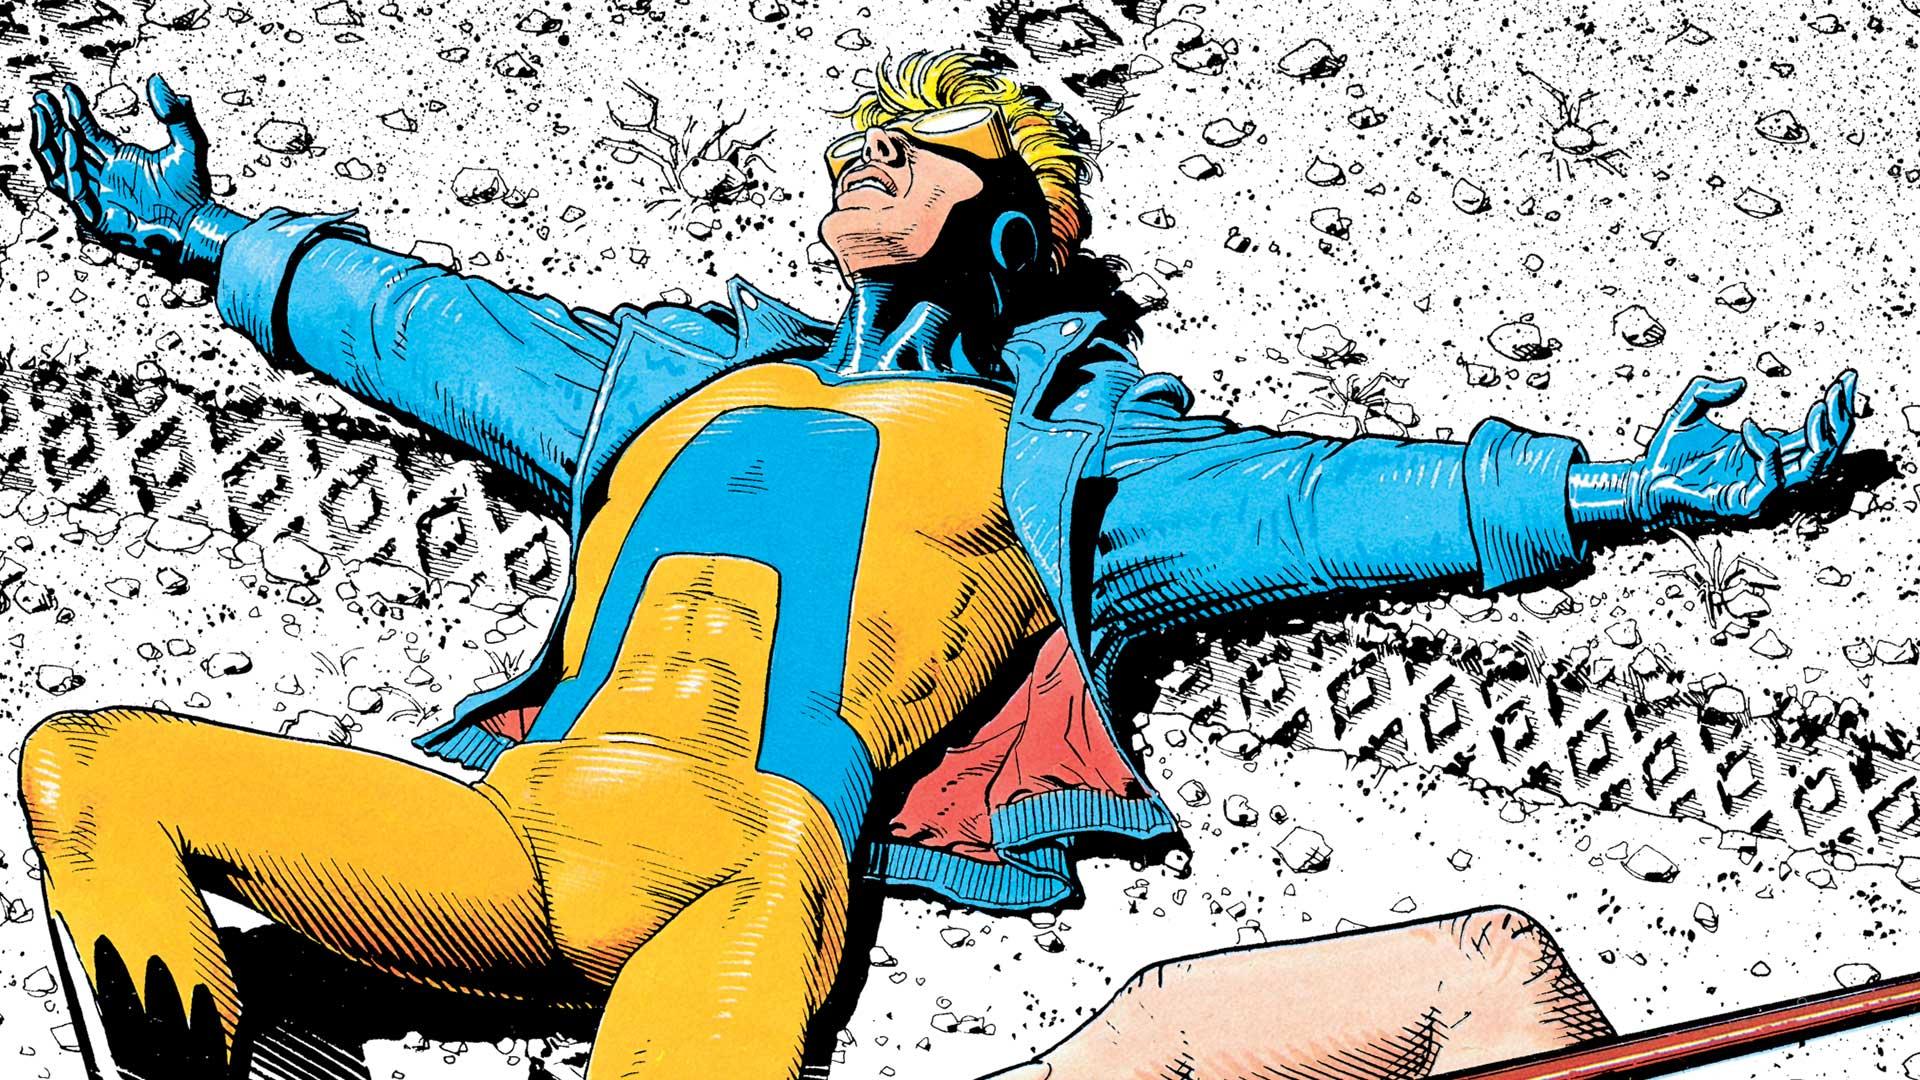 Golem-Comics-resena-Animal-man-morrison-04